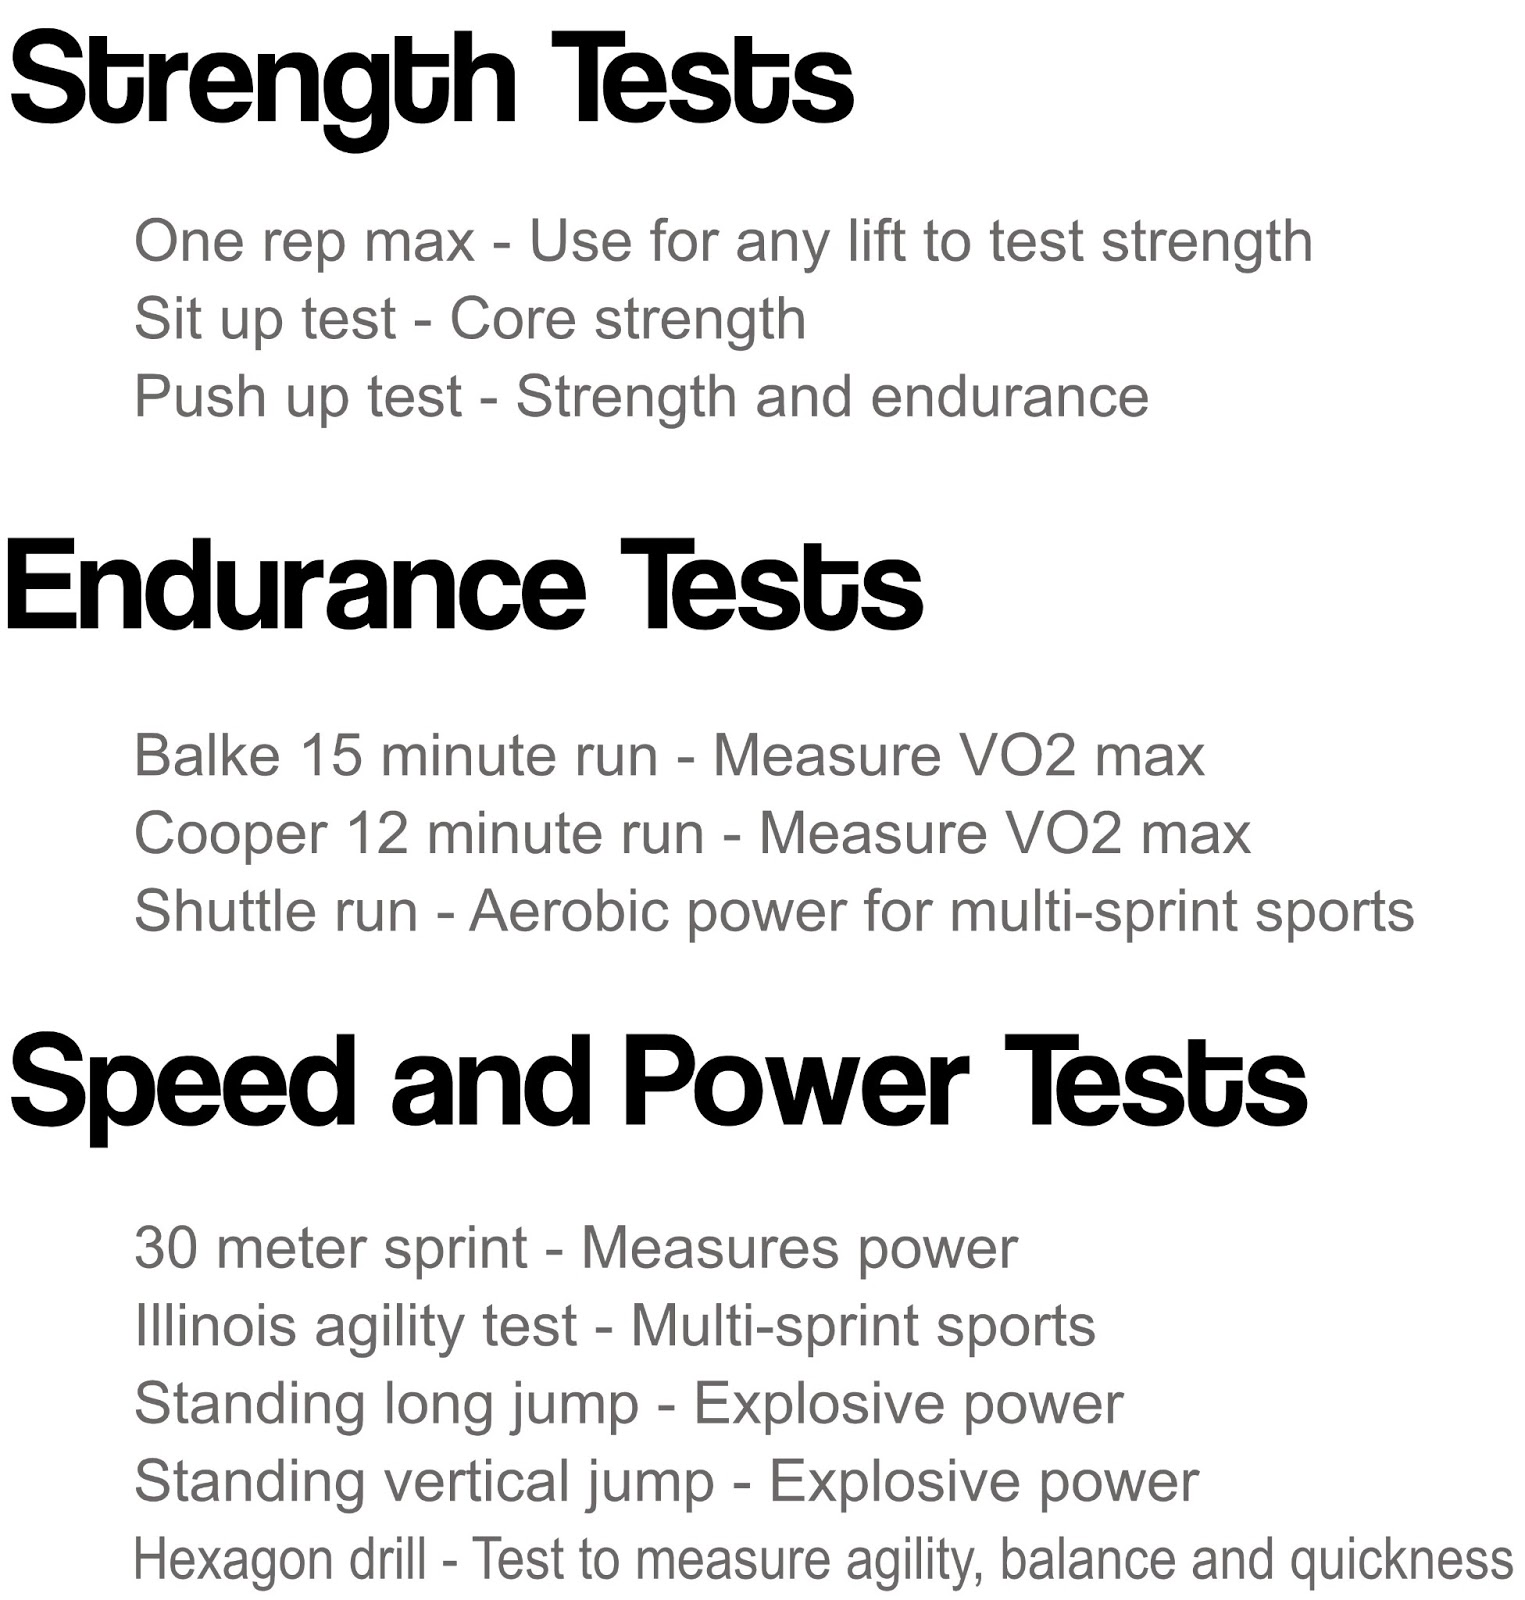 1TopForYou: fitness run test - The truth